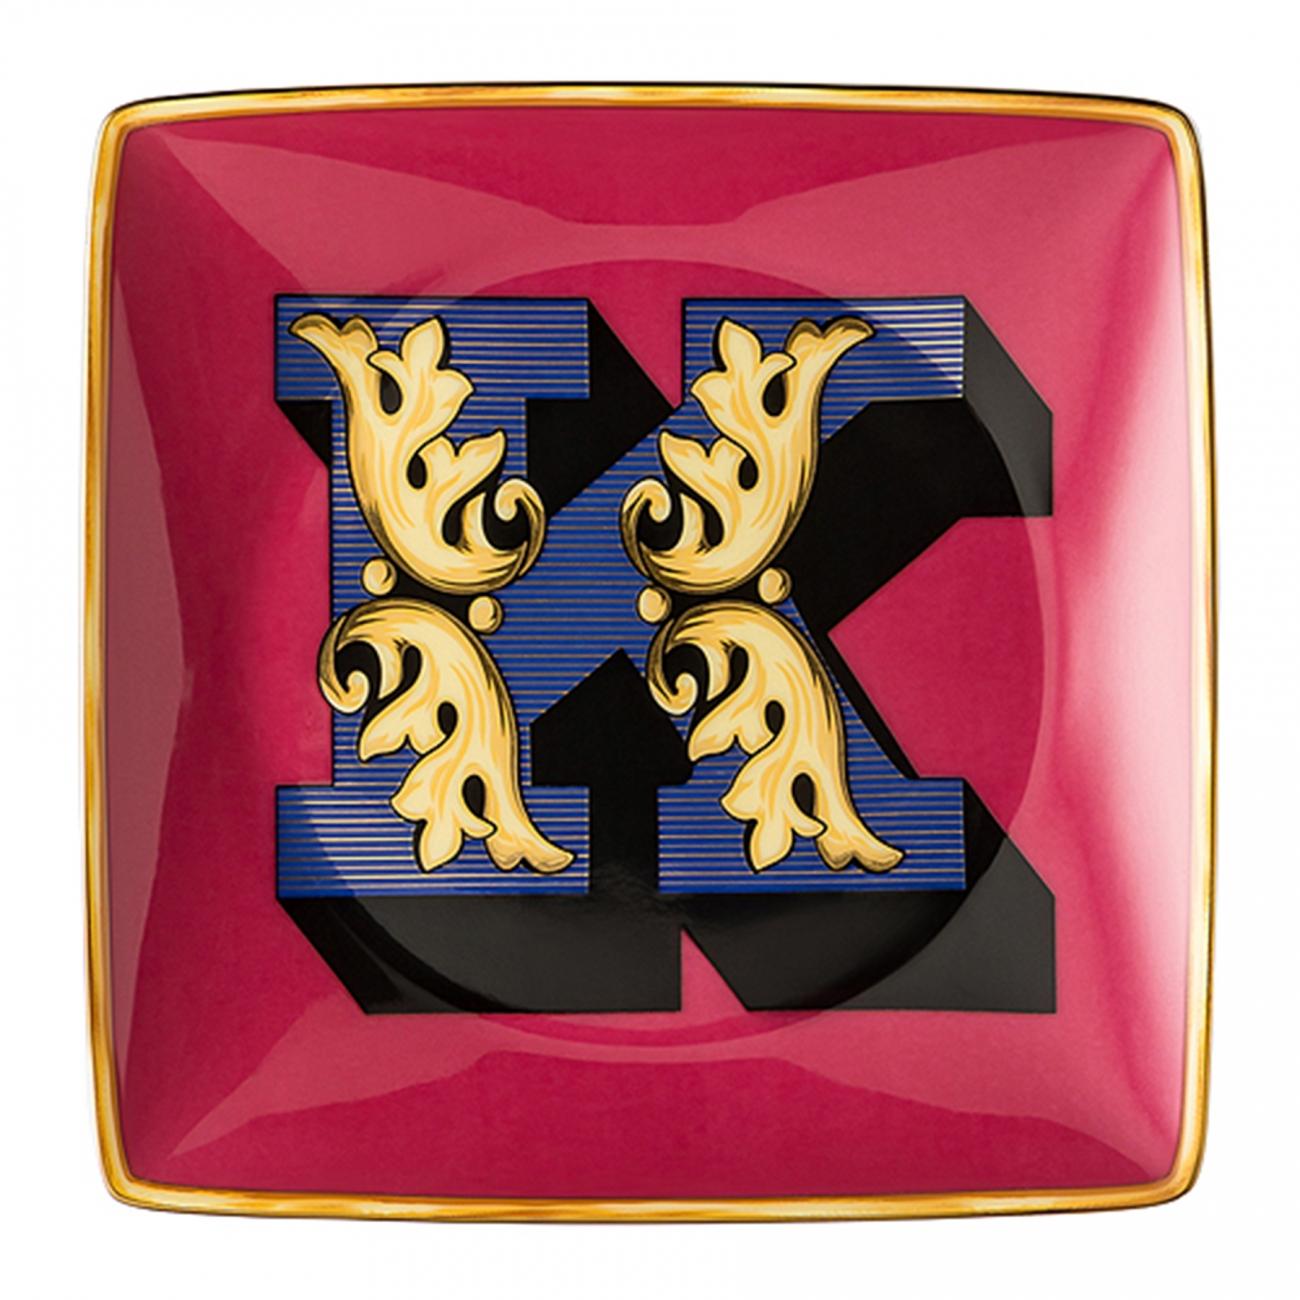 Rosenthal Versace Alphabet K Coppetta quadra piana